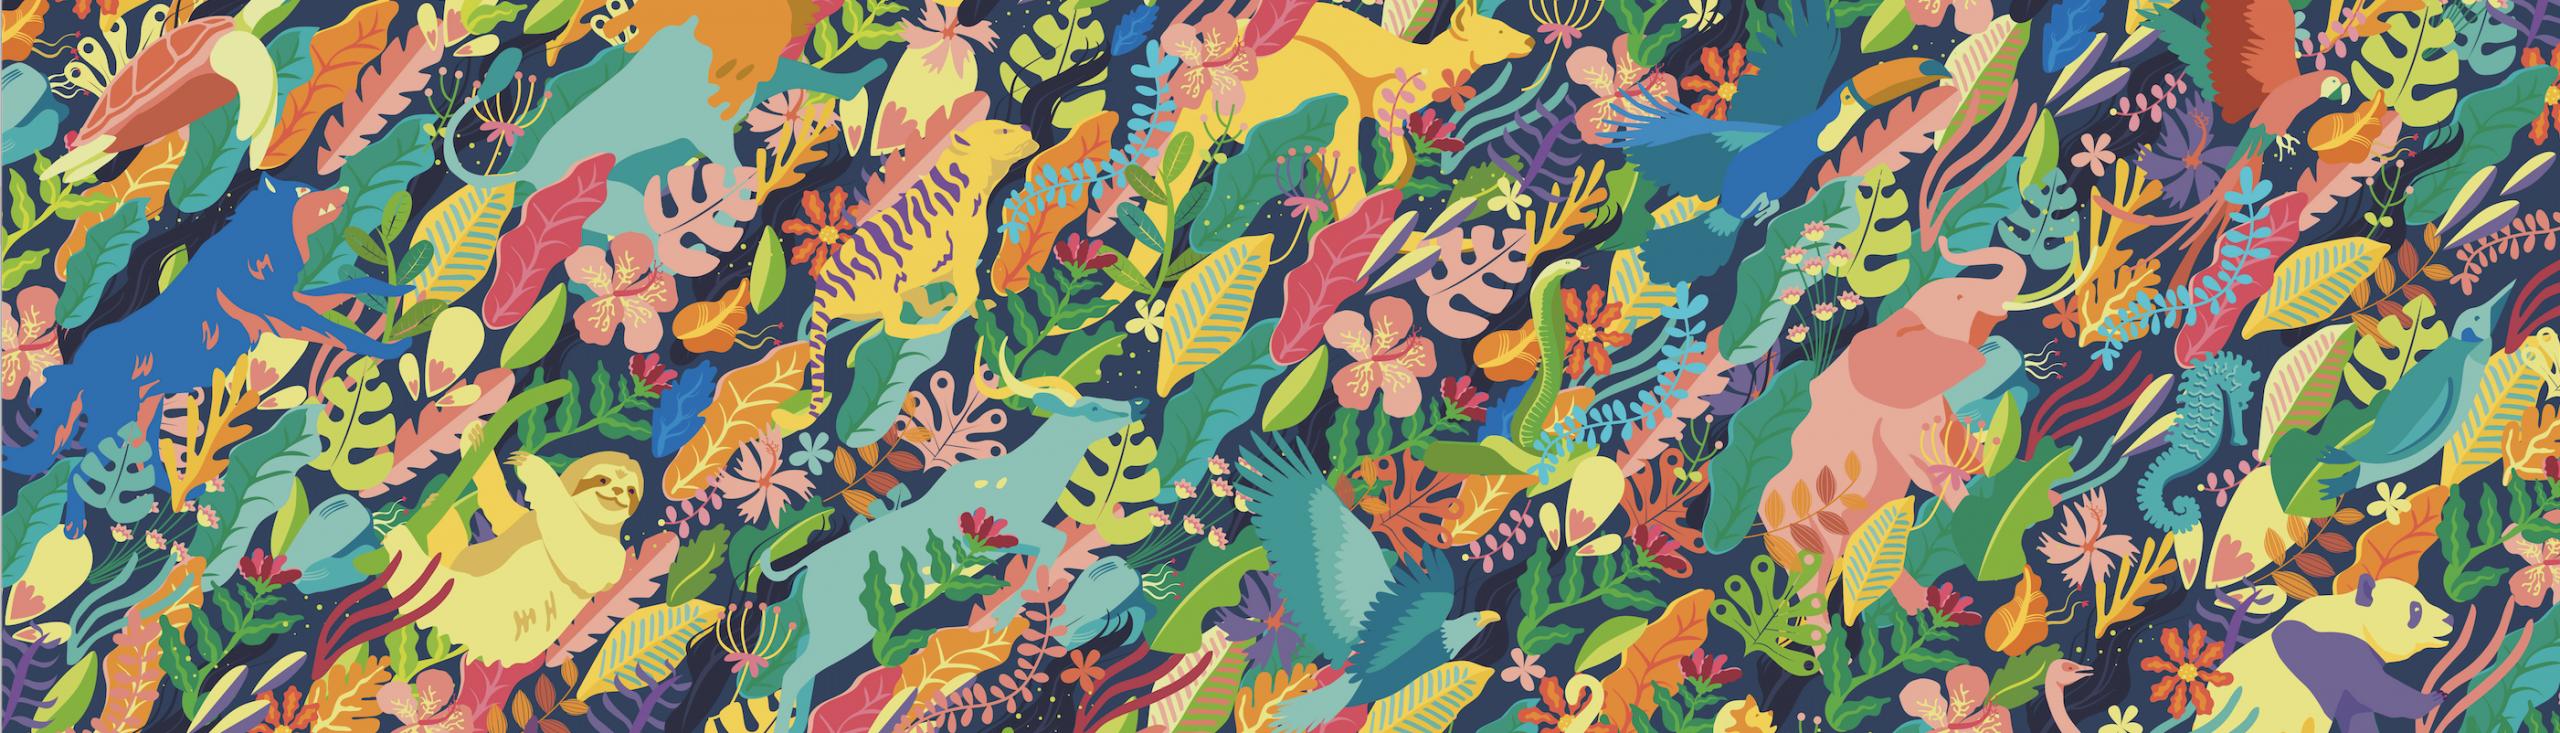 Avaaz - Duque - Letters For Life On Earth avec Serre De Jardin Amazon